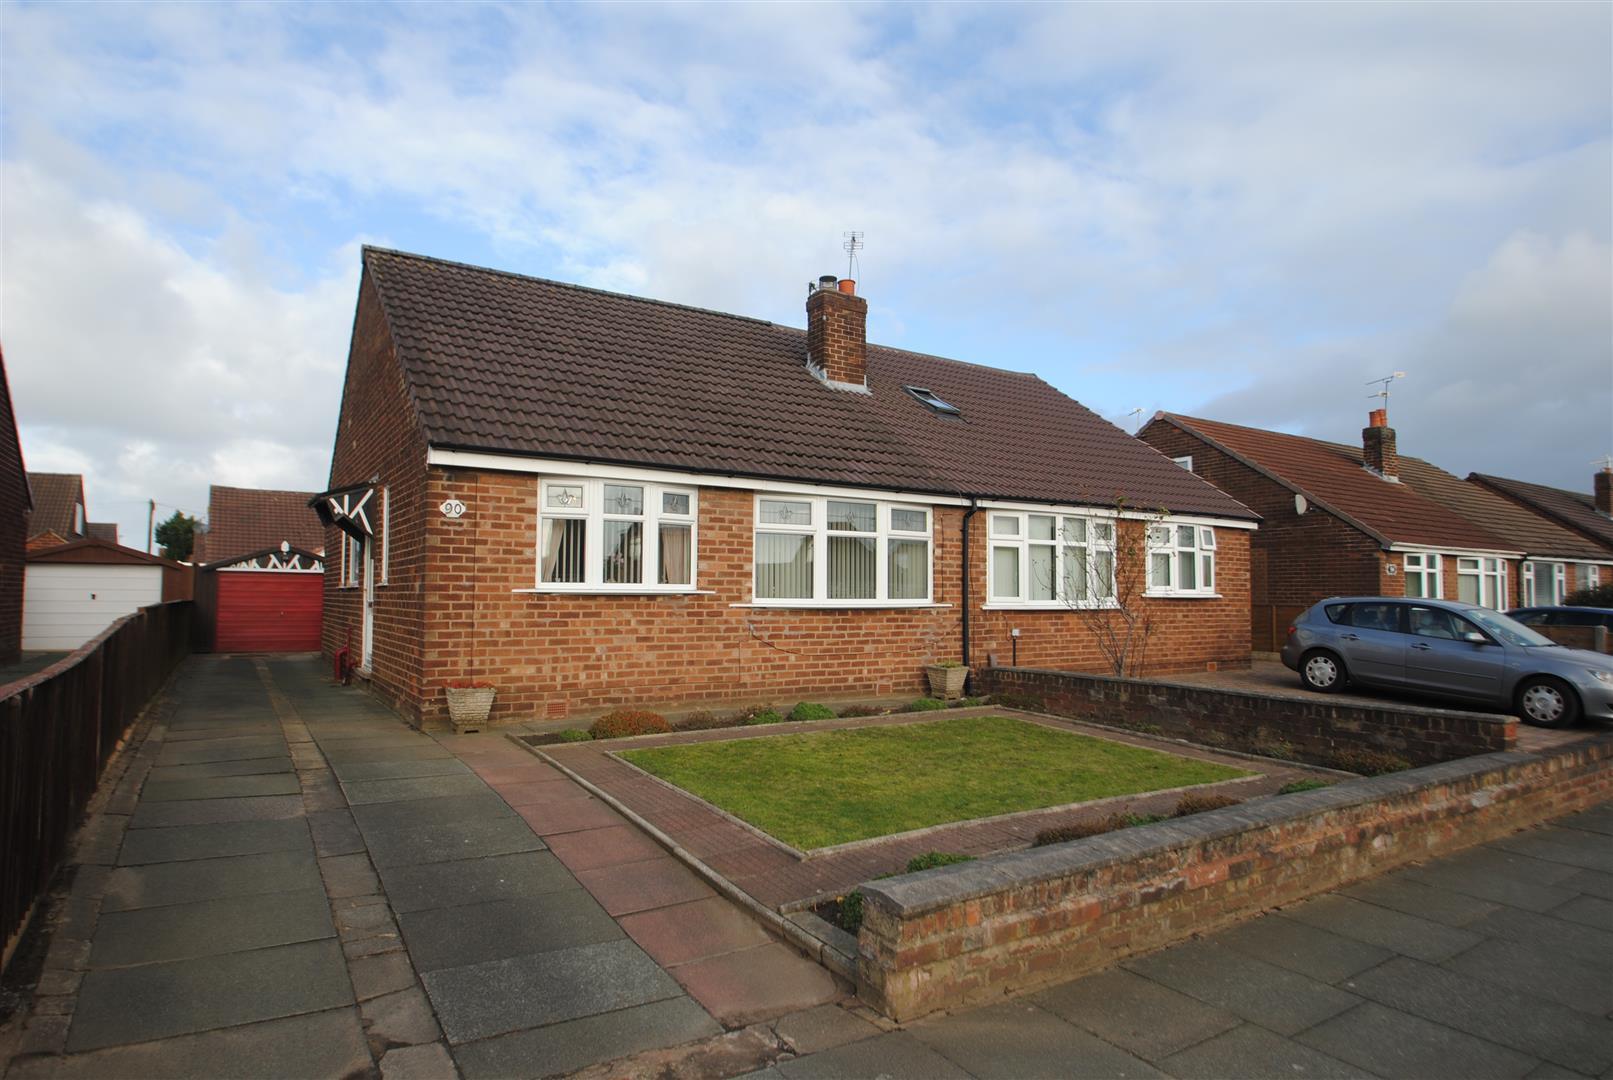 2 Bedrooms Bungalow for sale in Gainsborough Road, Warrington